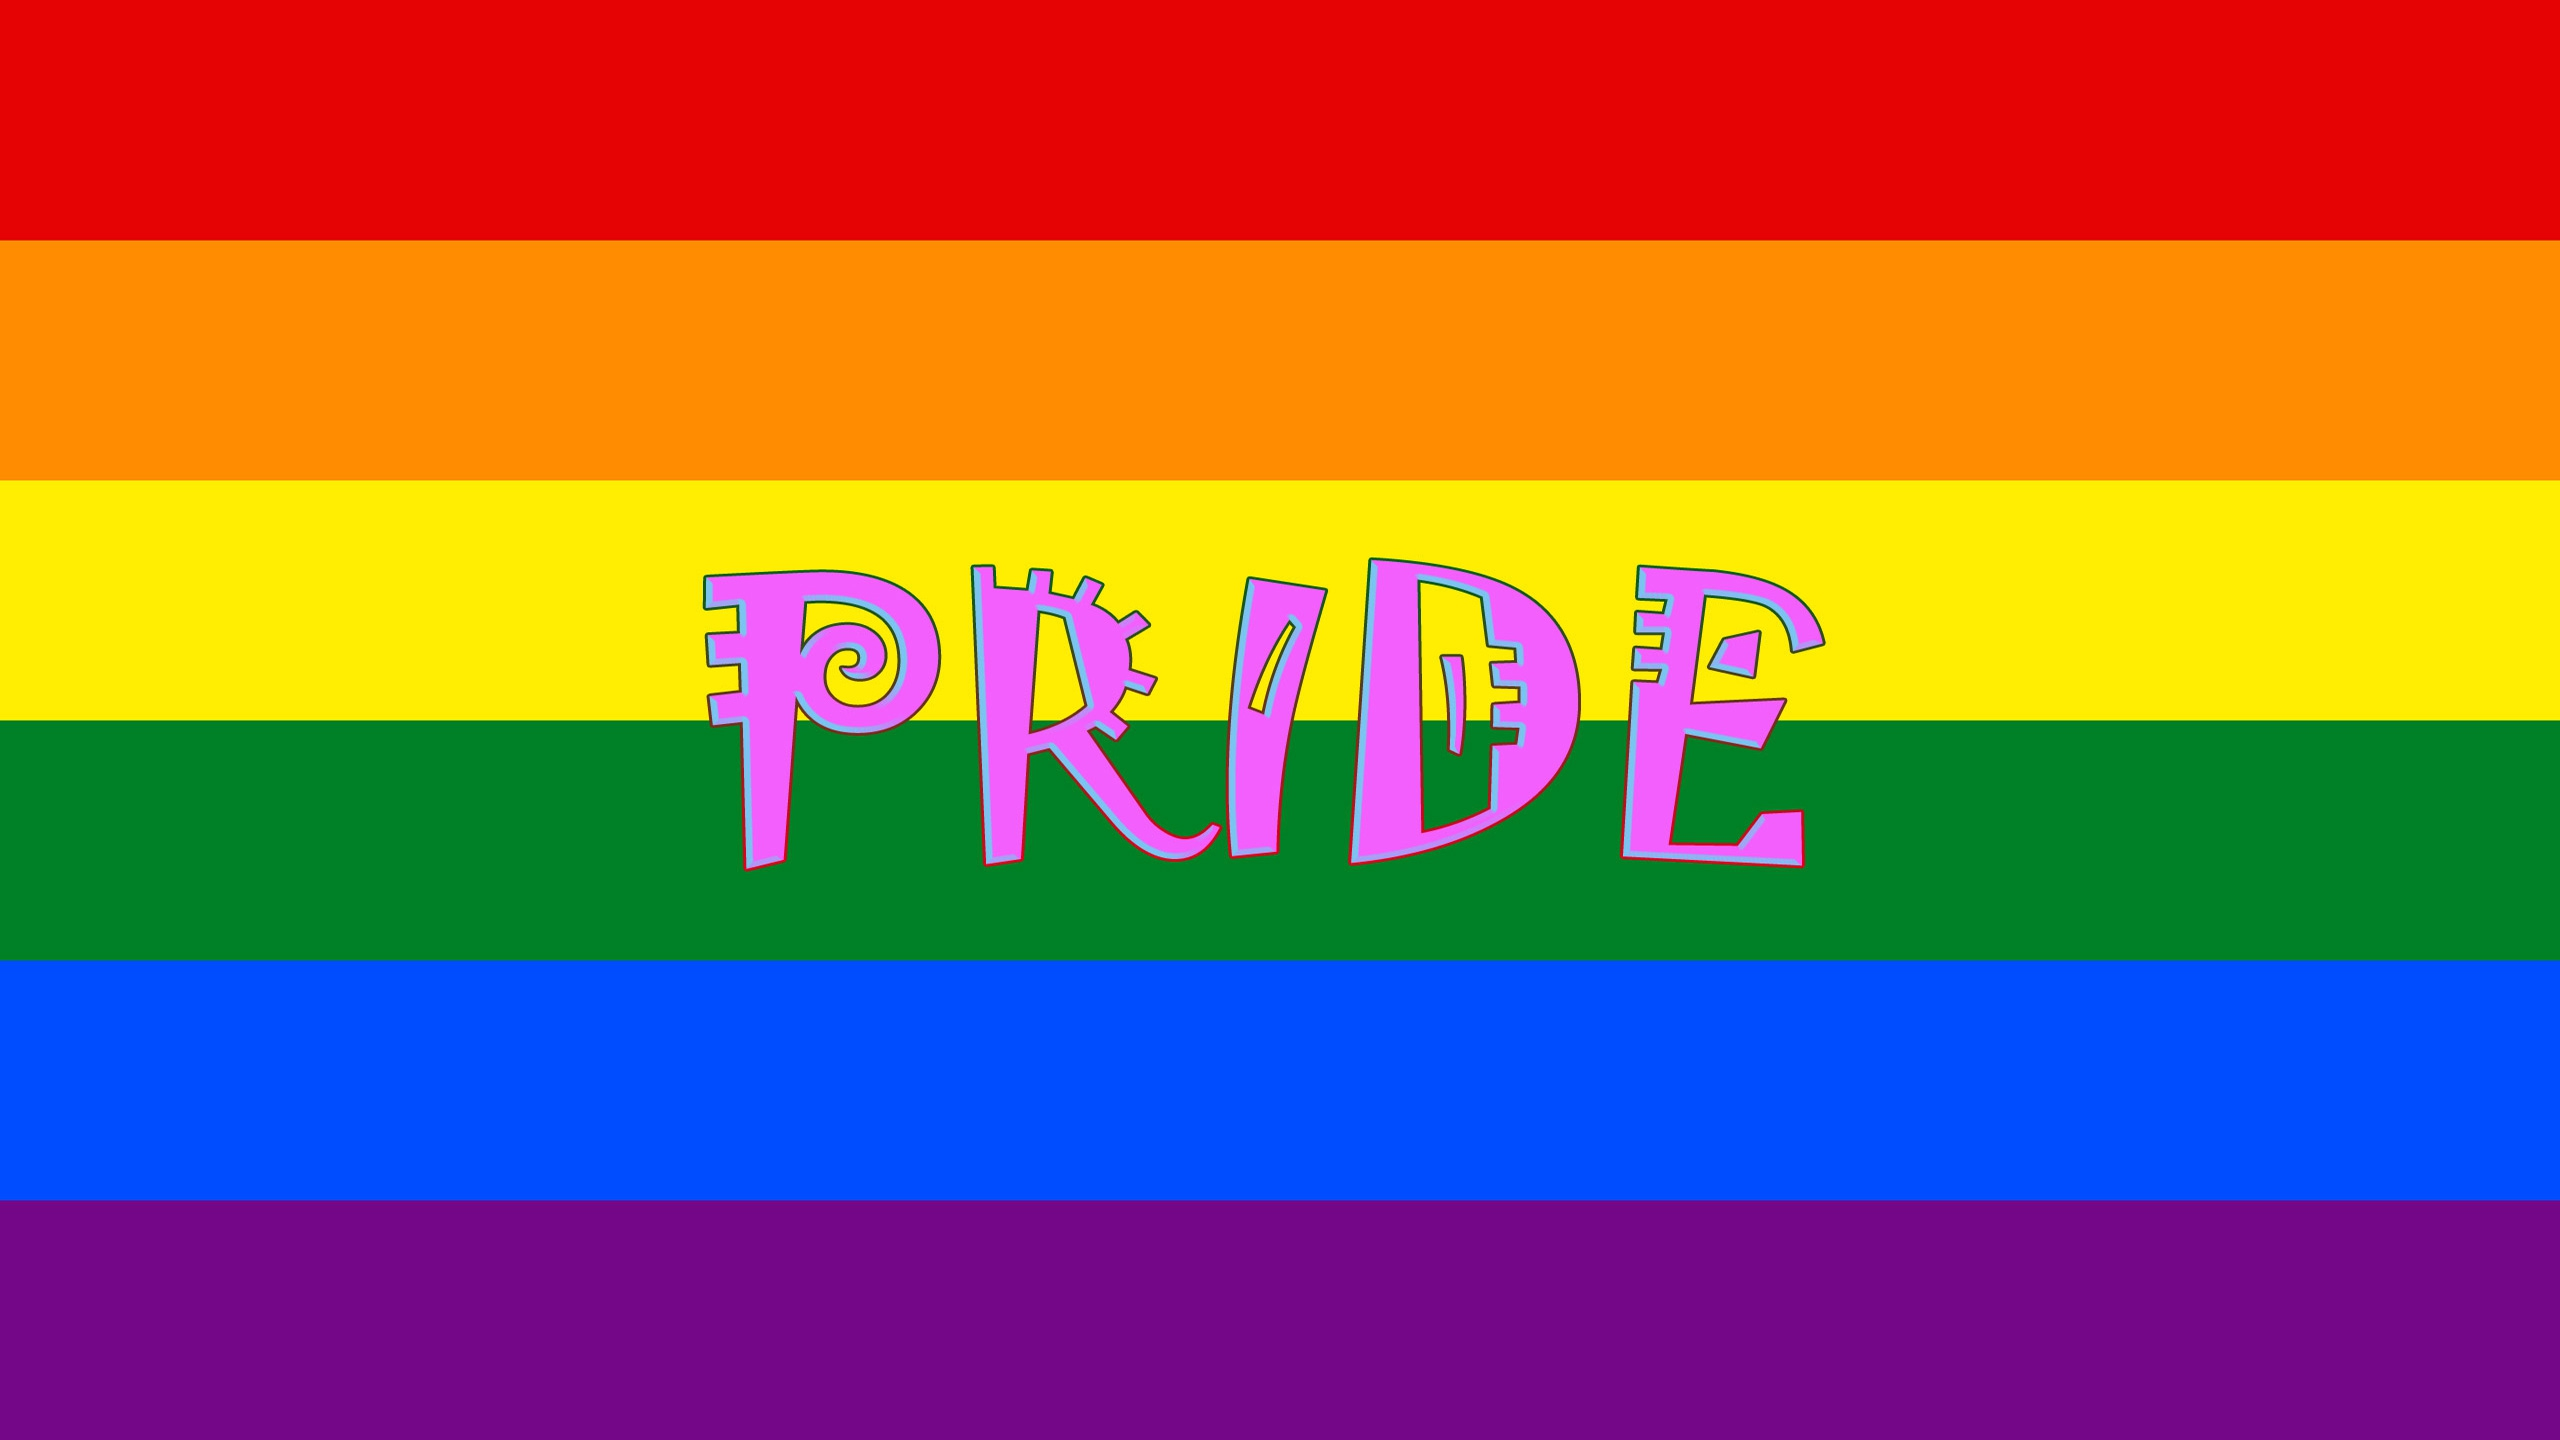 Hypebeast Quotes Wallpaper Hd Gay Pride Backgrounds Pixelstalk Net